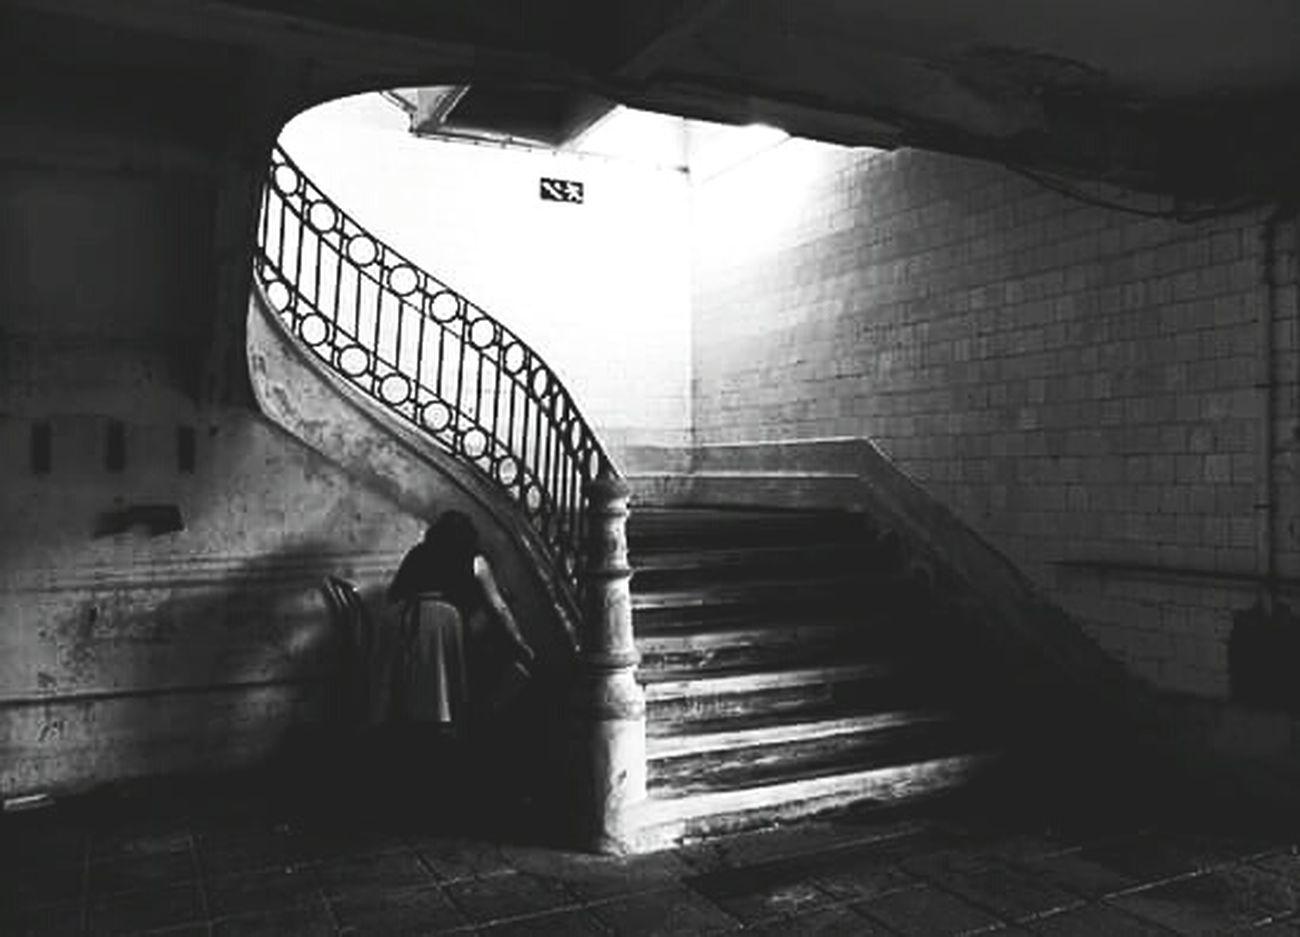 Thestreetphotographer EyeEn Porto B&w Street Photography Streetphotography Monochrome Street Photography EyeEm Porto Capture The Moment First Eyeem Photo Blackandwhite Photography Blackandwhite Fujifilm